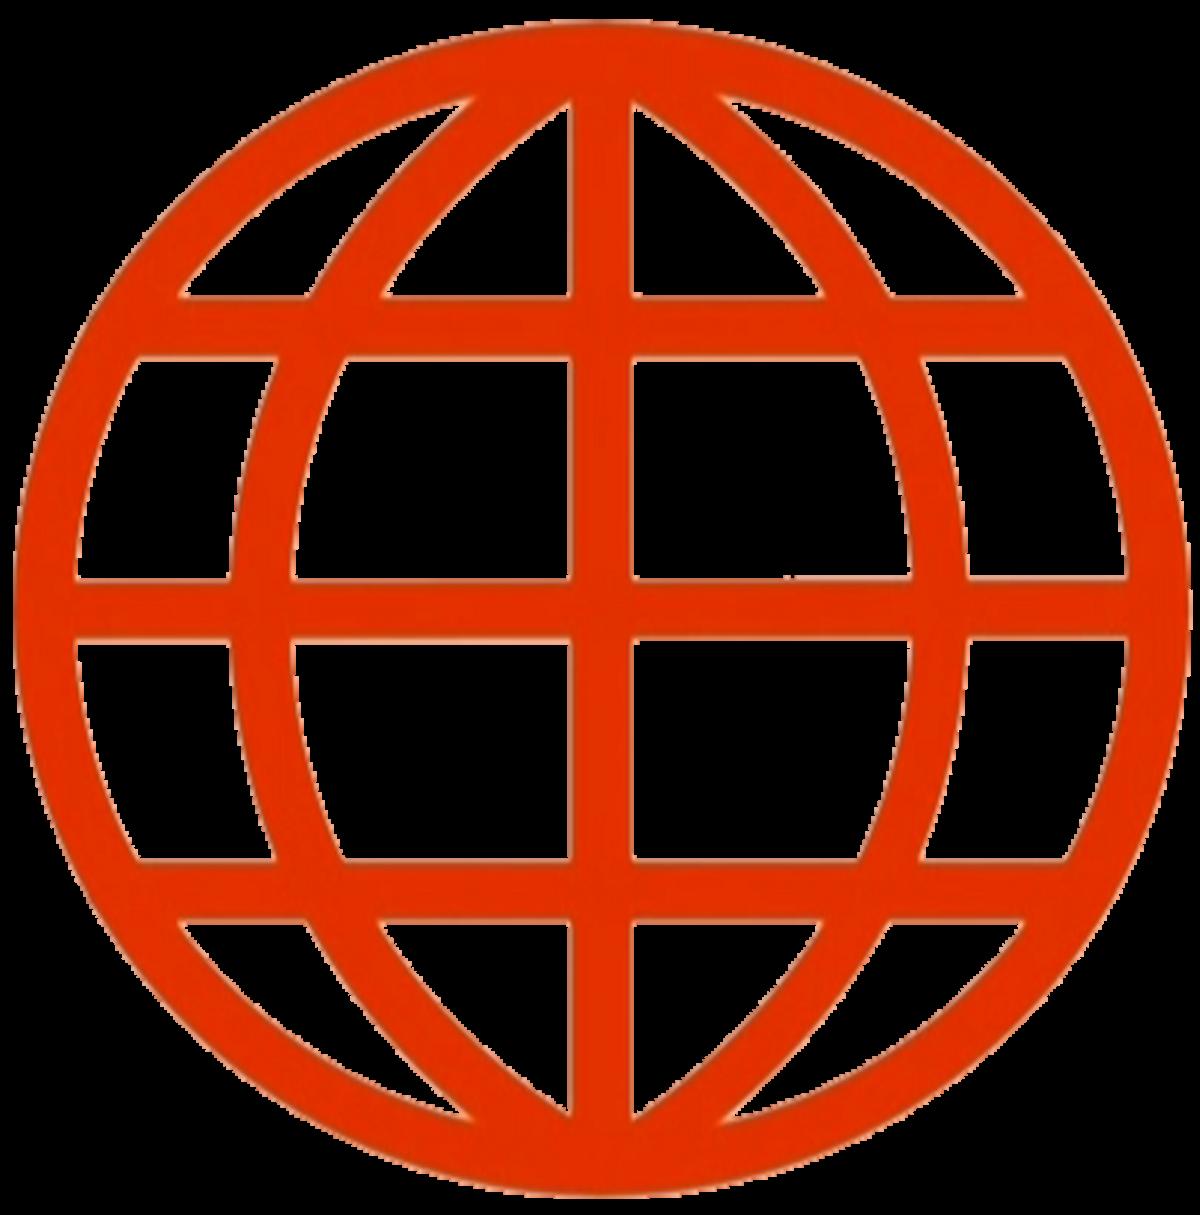 América Televisión Perú – Wikipédia, a enciclopédia livre